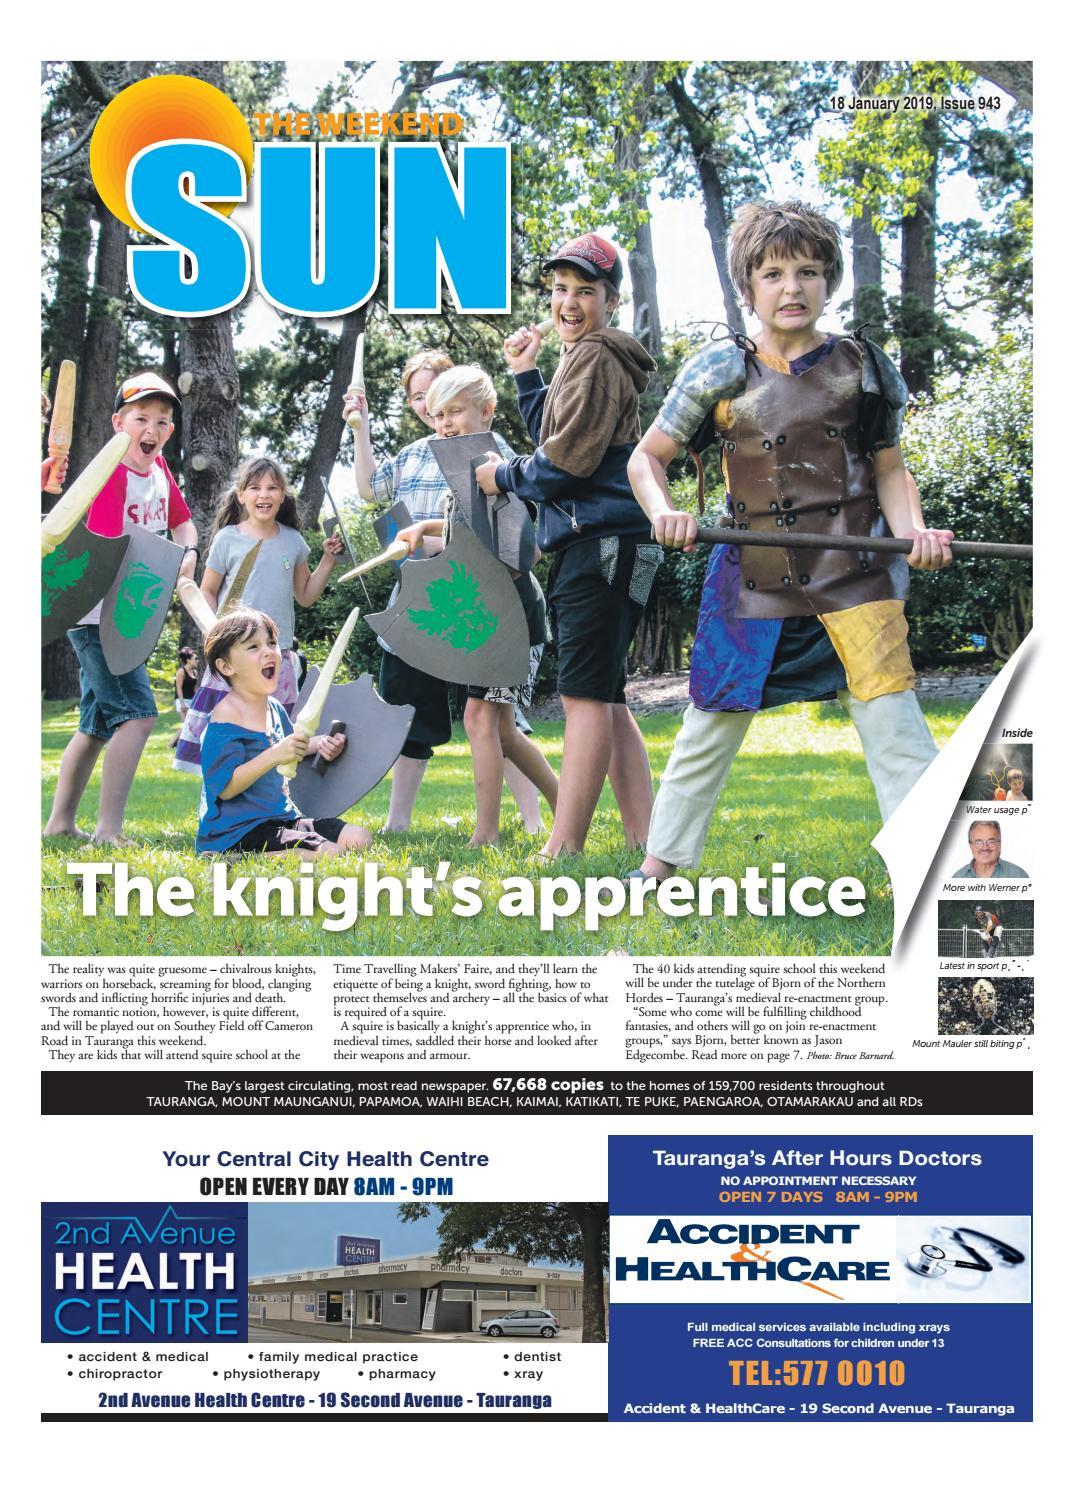 The Weekend Sun - 18 January 2019 by Sun Media - issuu